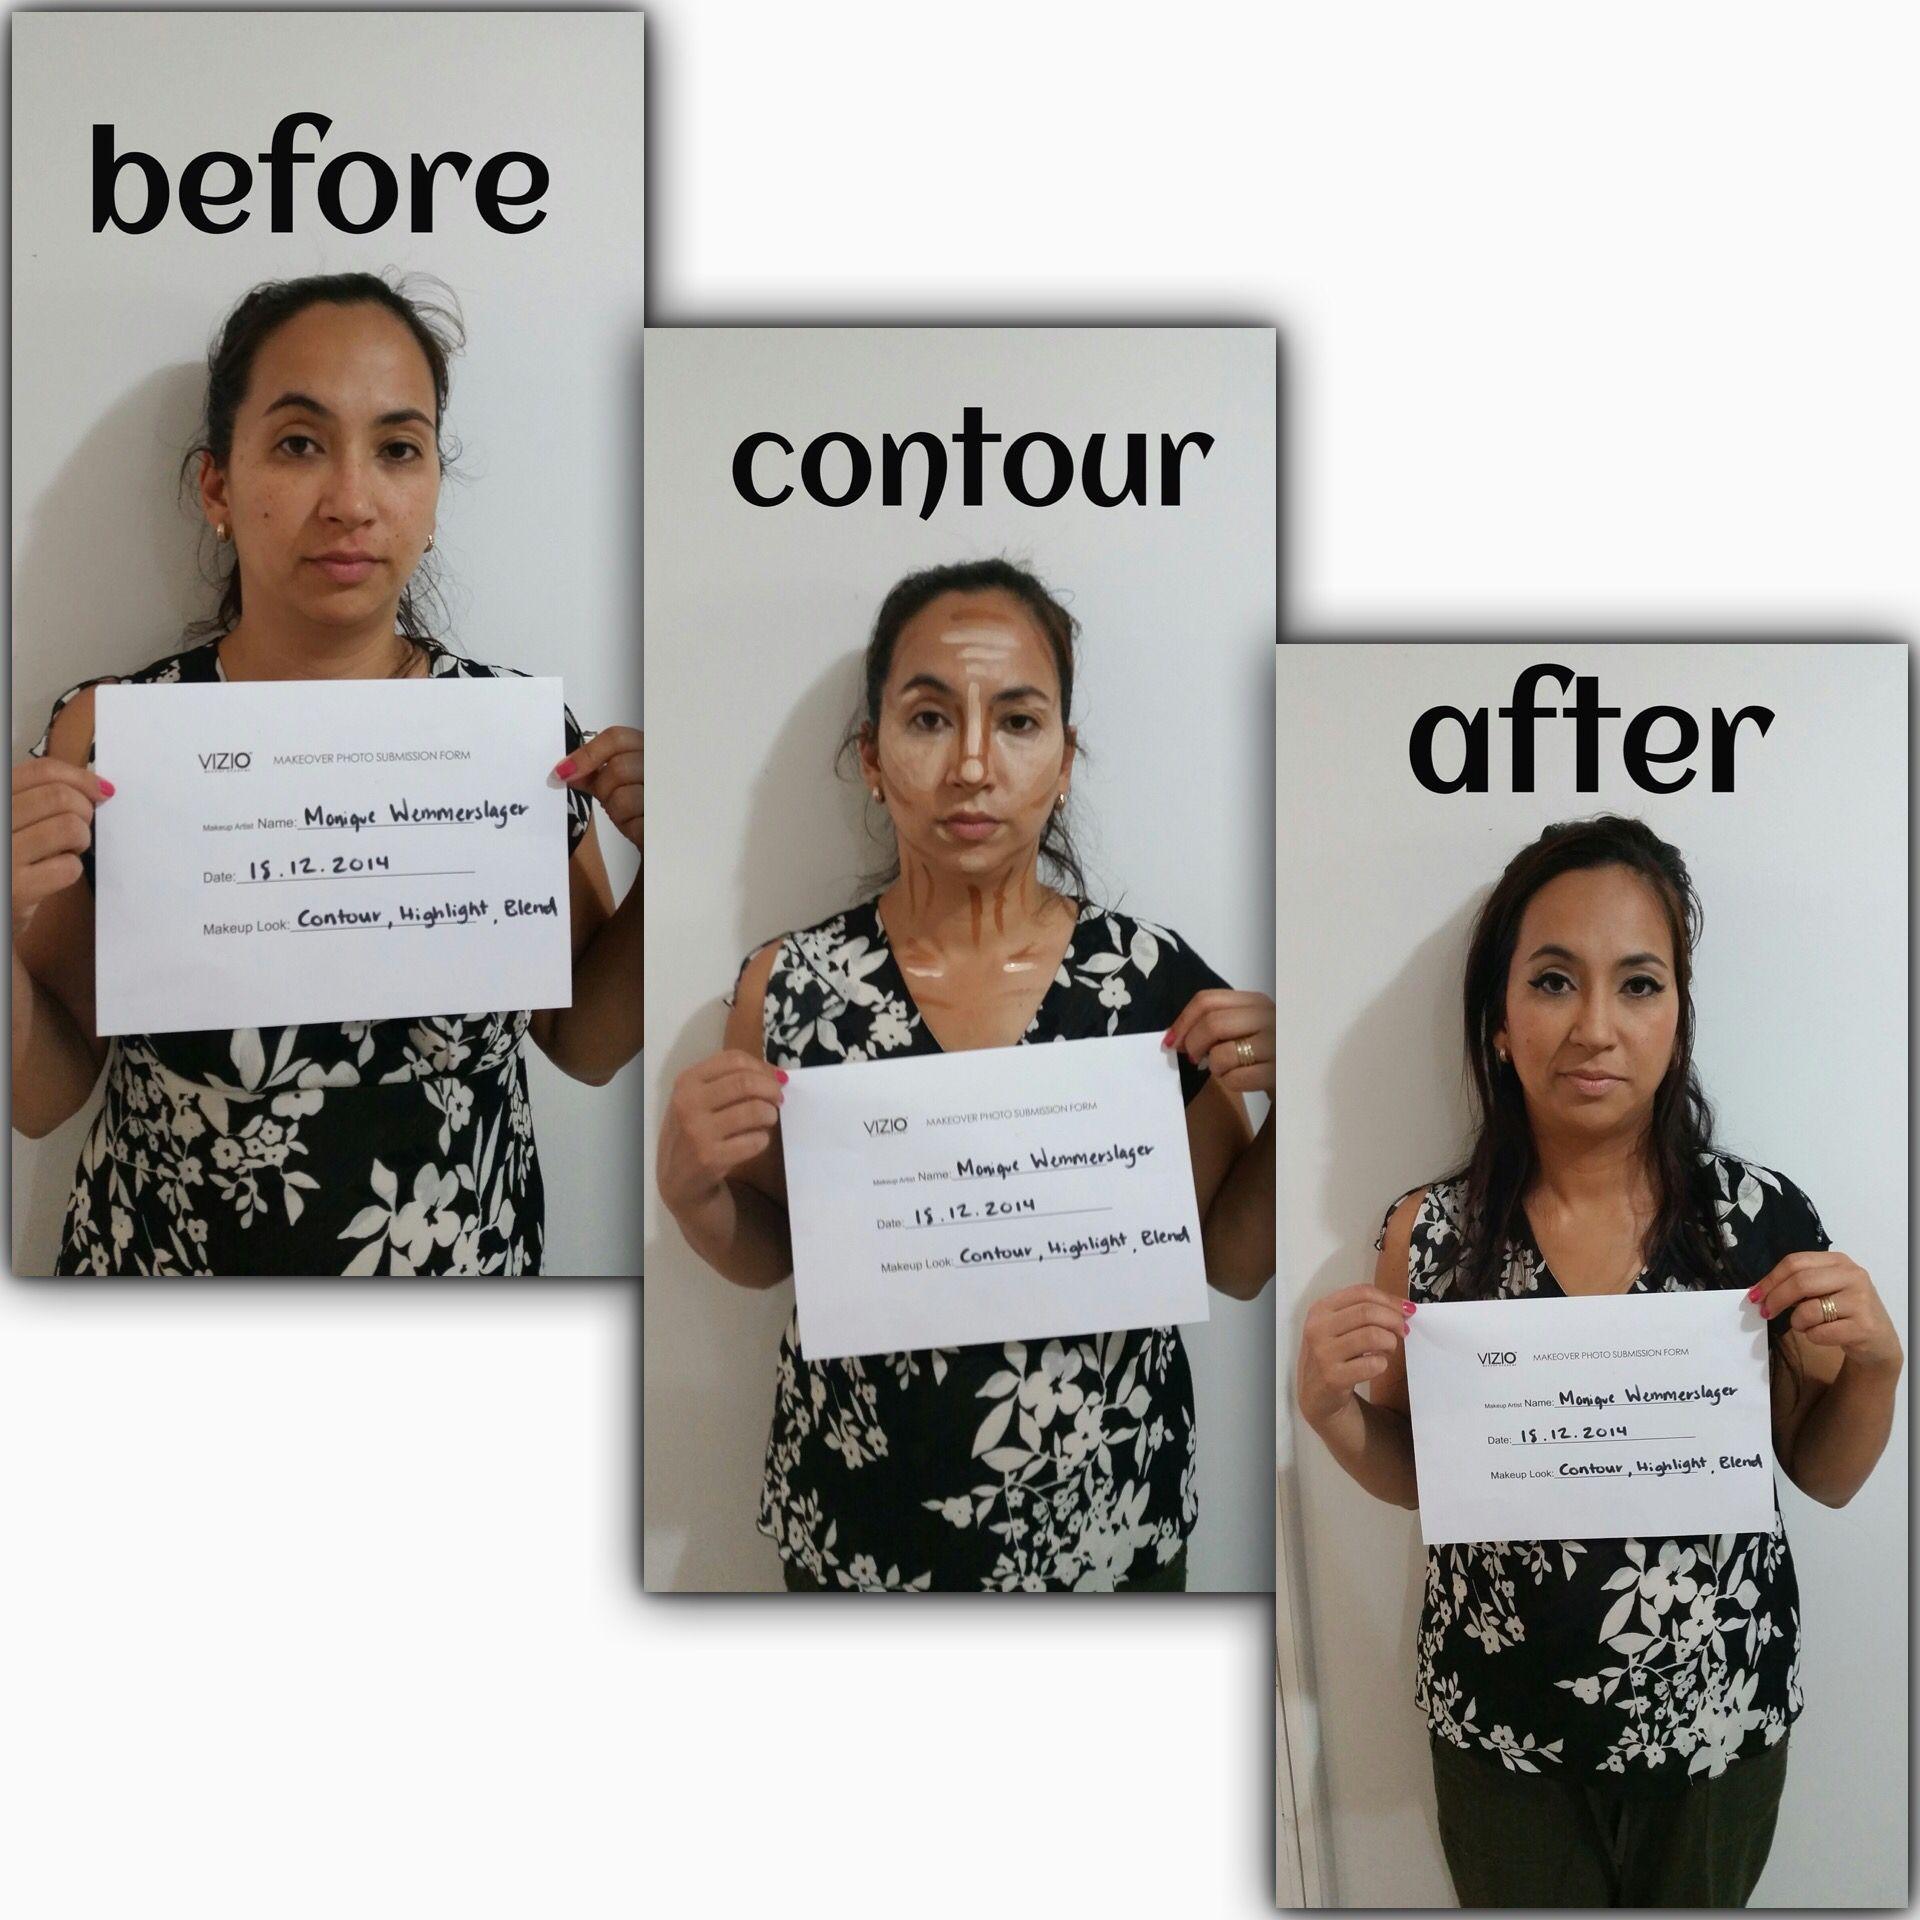 Monique makeup application assignment Vizio, Polaroid